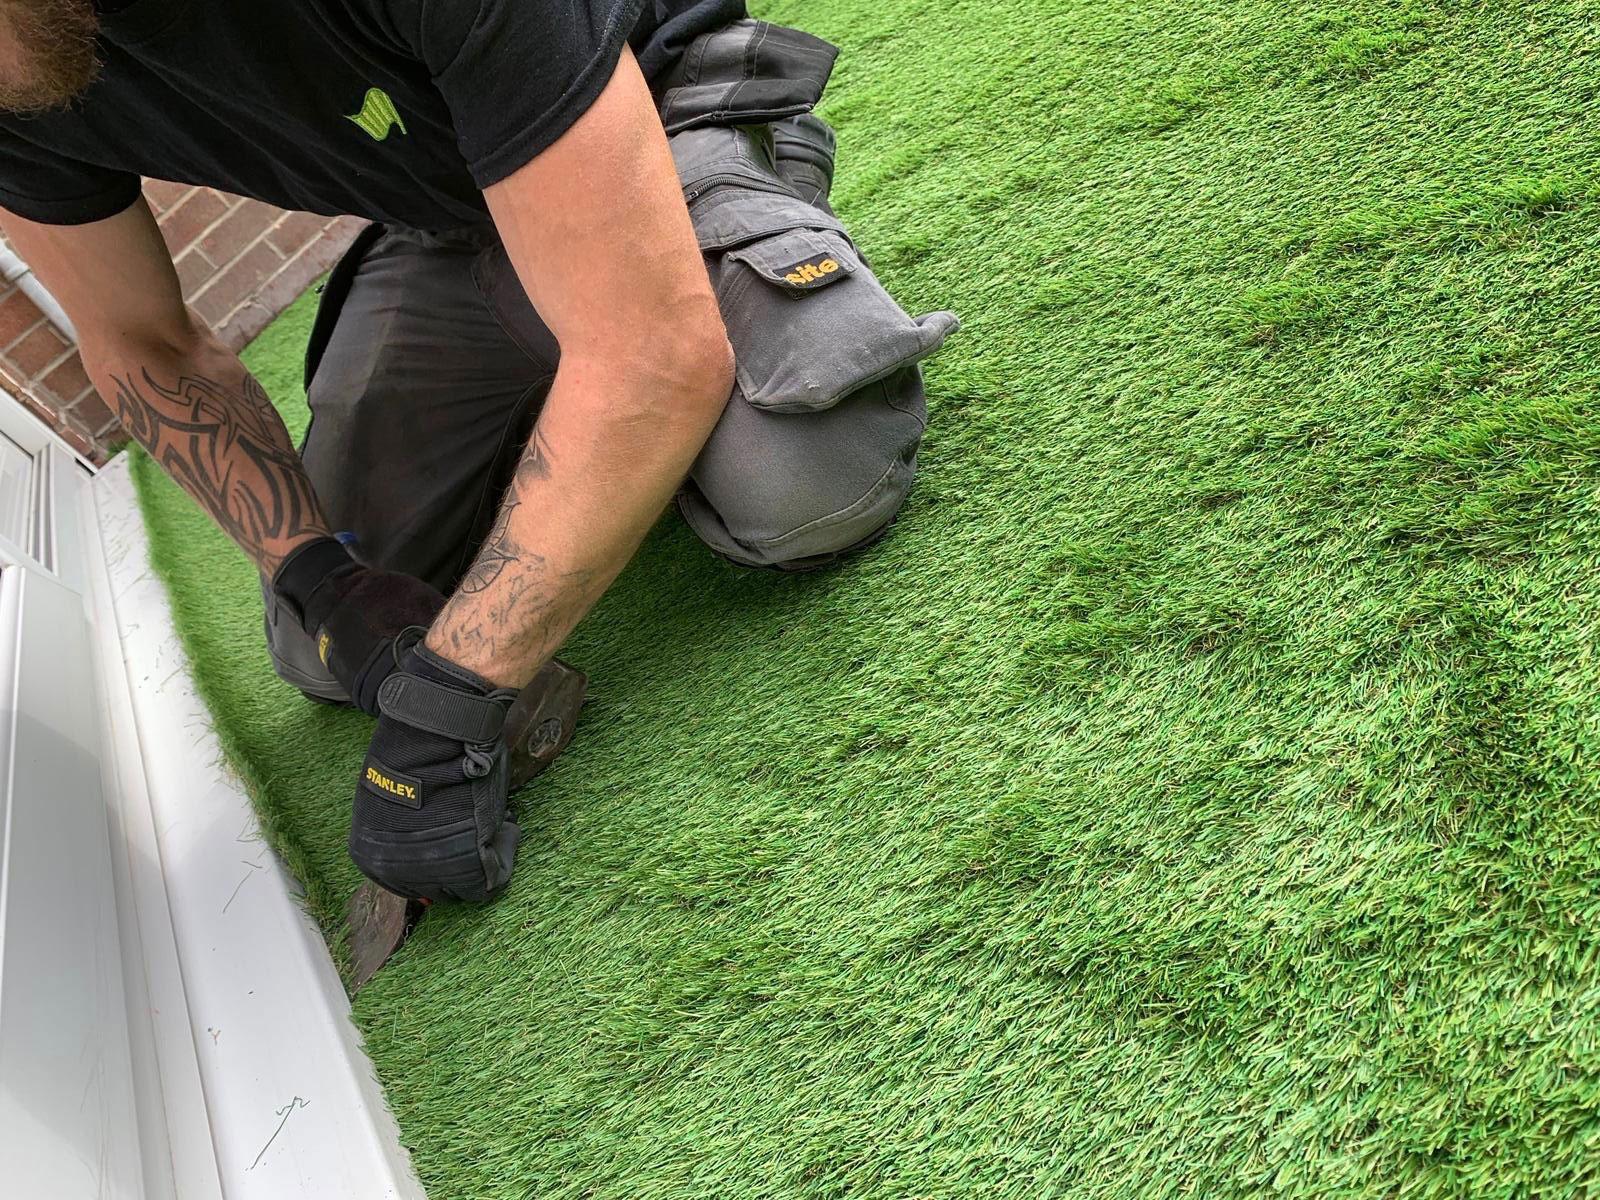 Fake Grass For Dogs Kidsgrove Artificial Super Grass